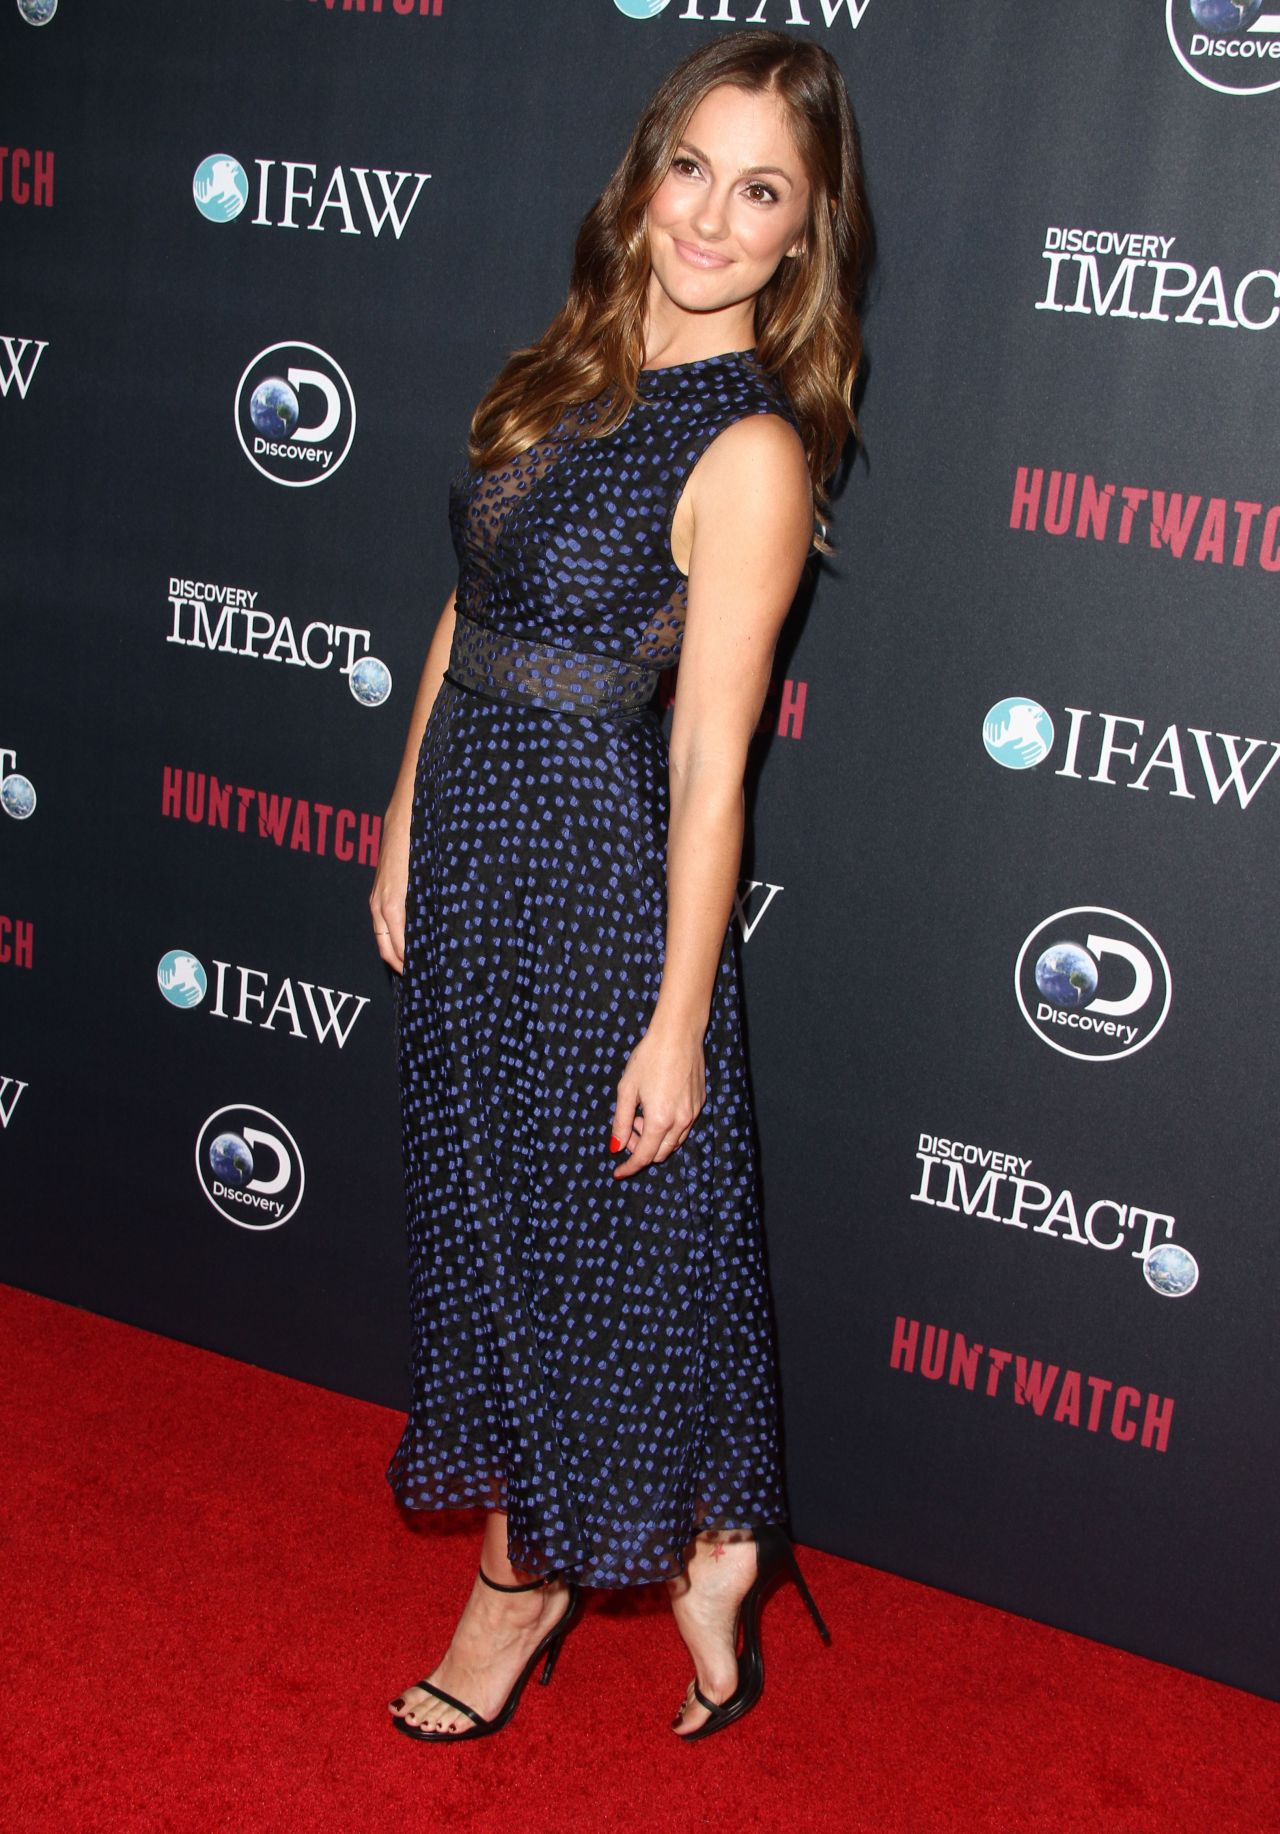 Minka Kelly Huntwatch Special Screening In Los Angeles